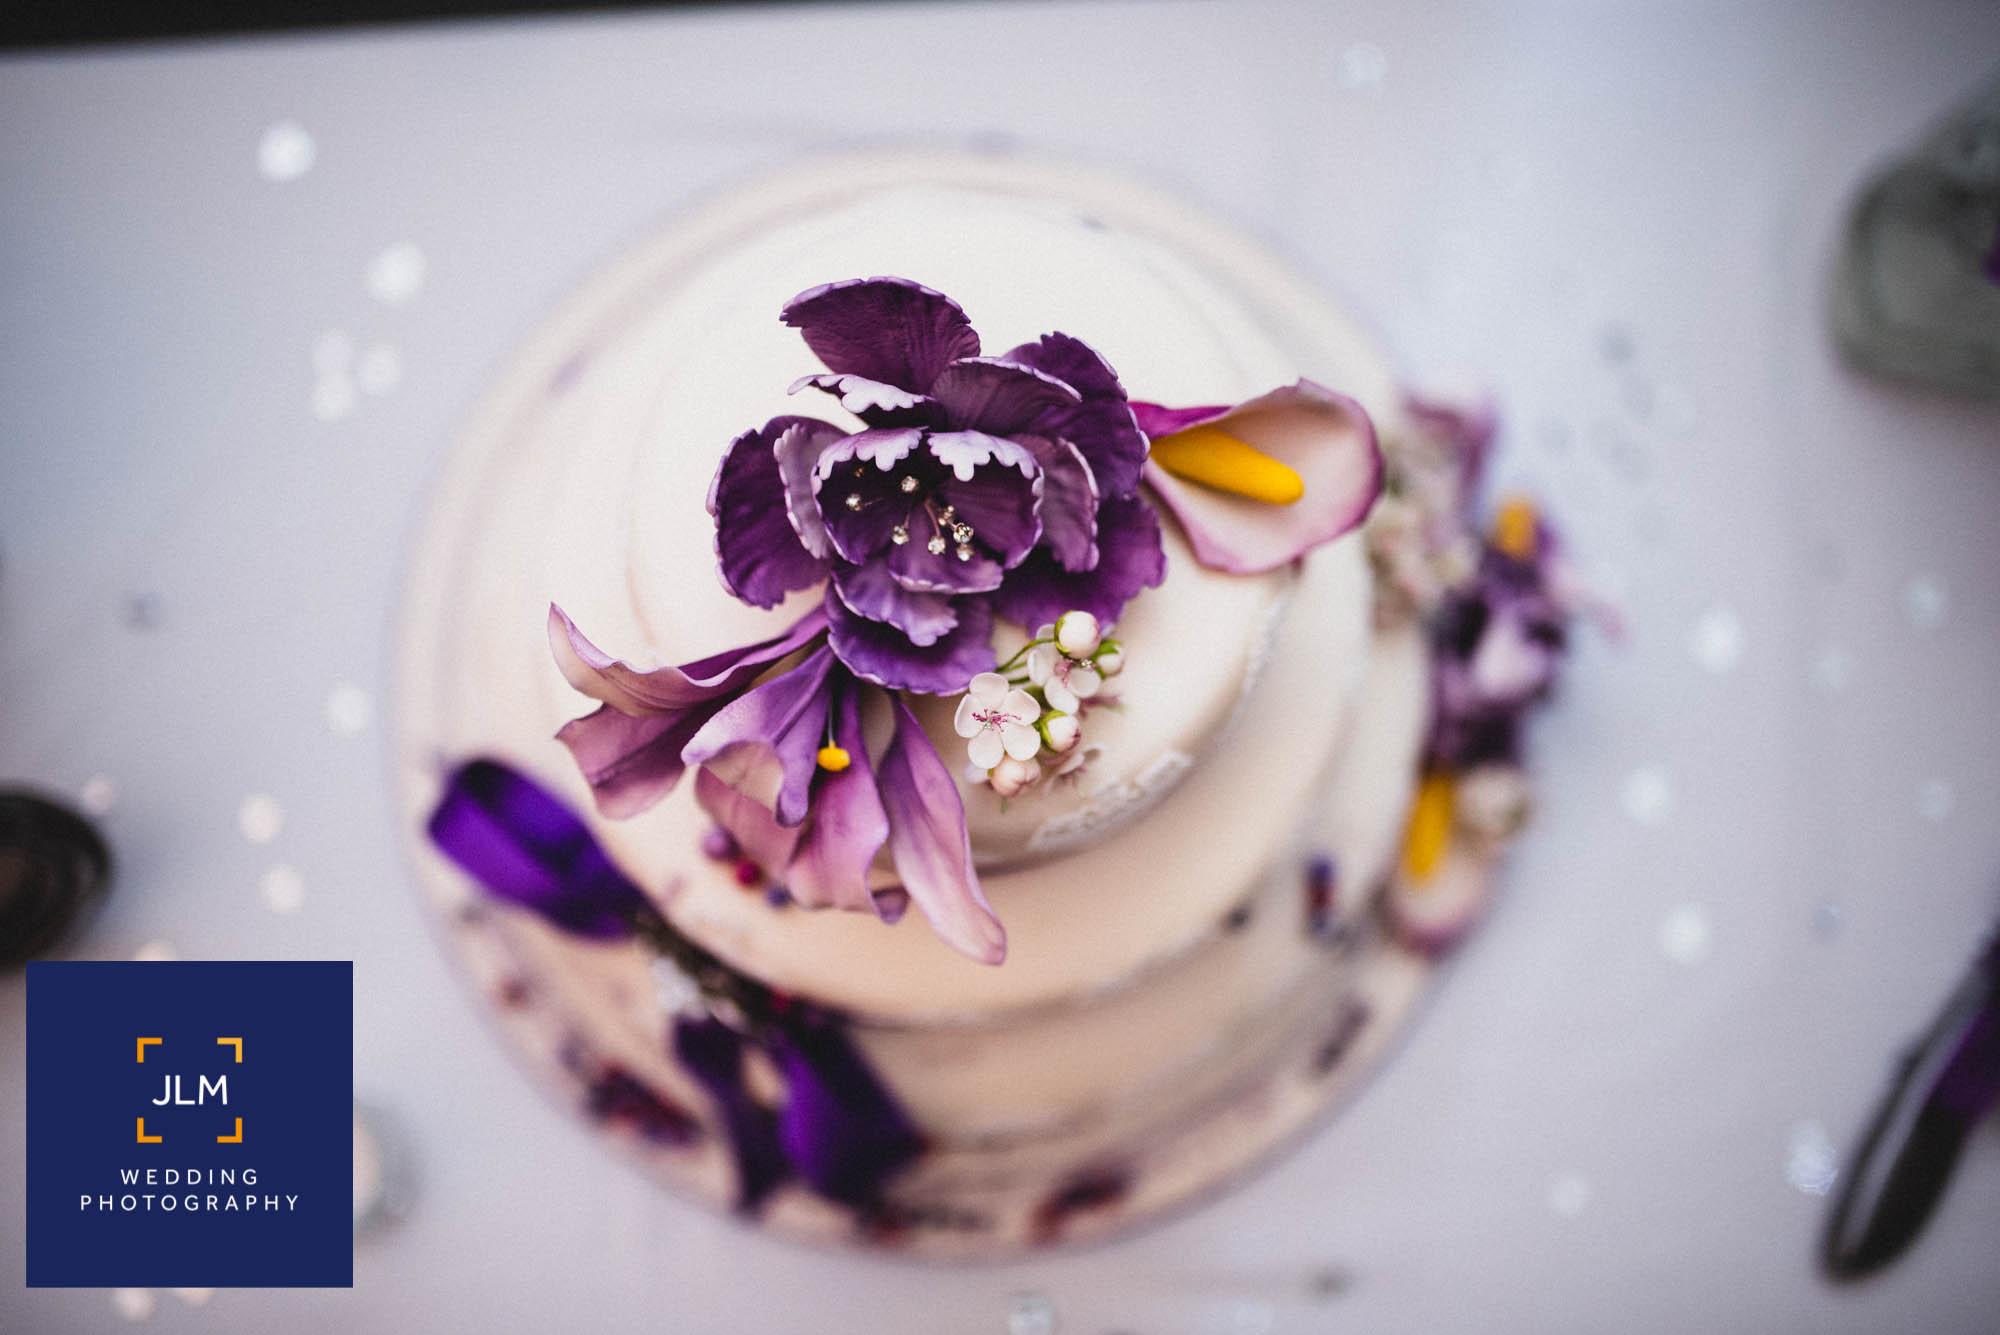 Wedding Cake Porn :: 32 Spectacular Wedding Cakes to Inspire You